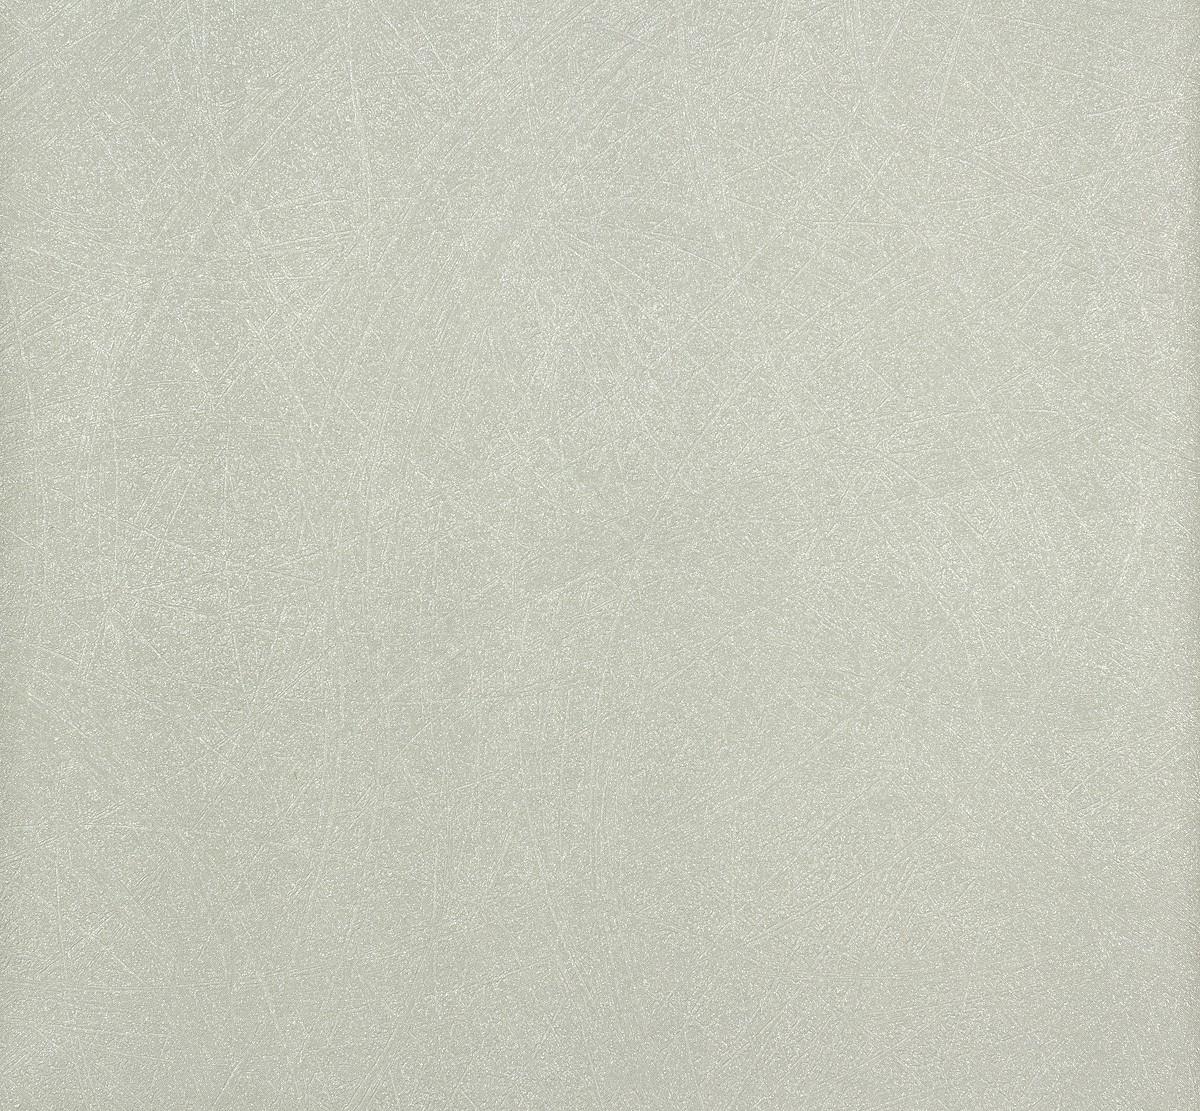 tapete rasch vliestapete 403626 tapete wischtechnik. Black Bedroom Furniture Sets. Home Design Ideas